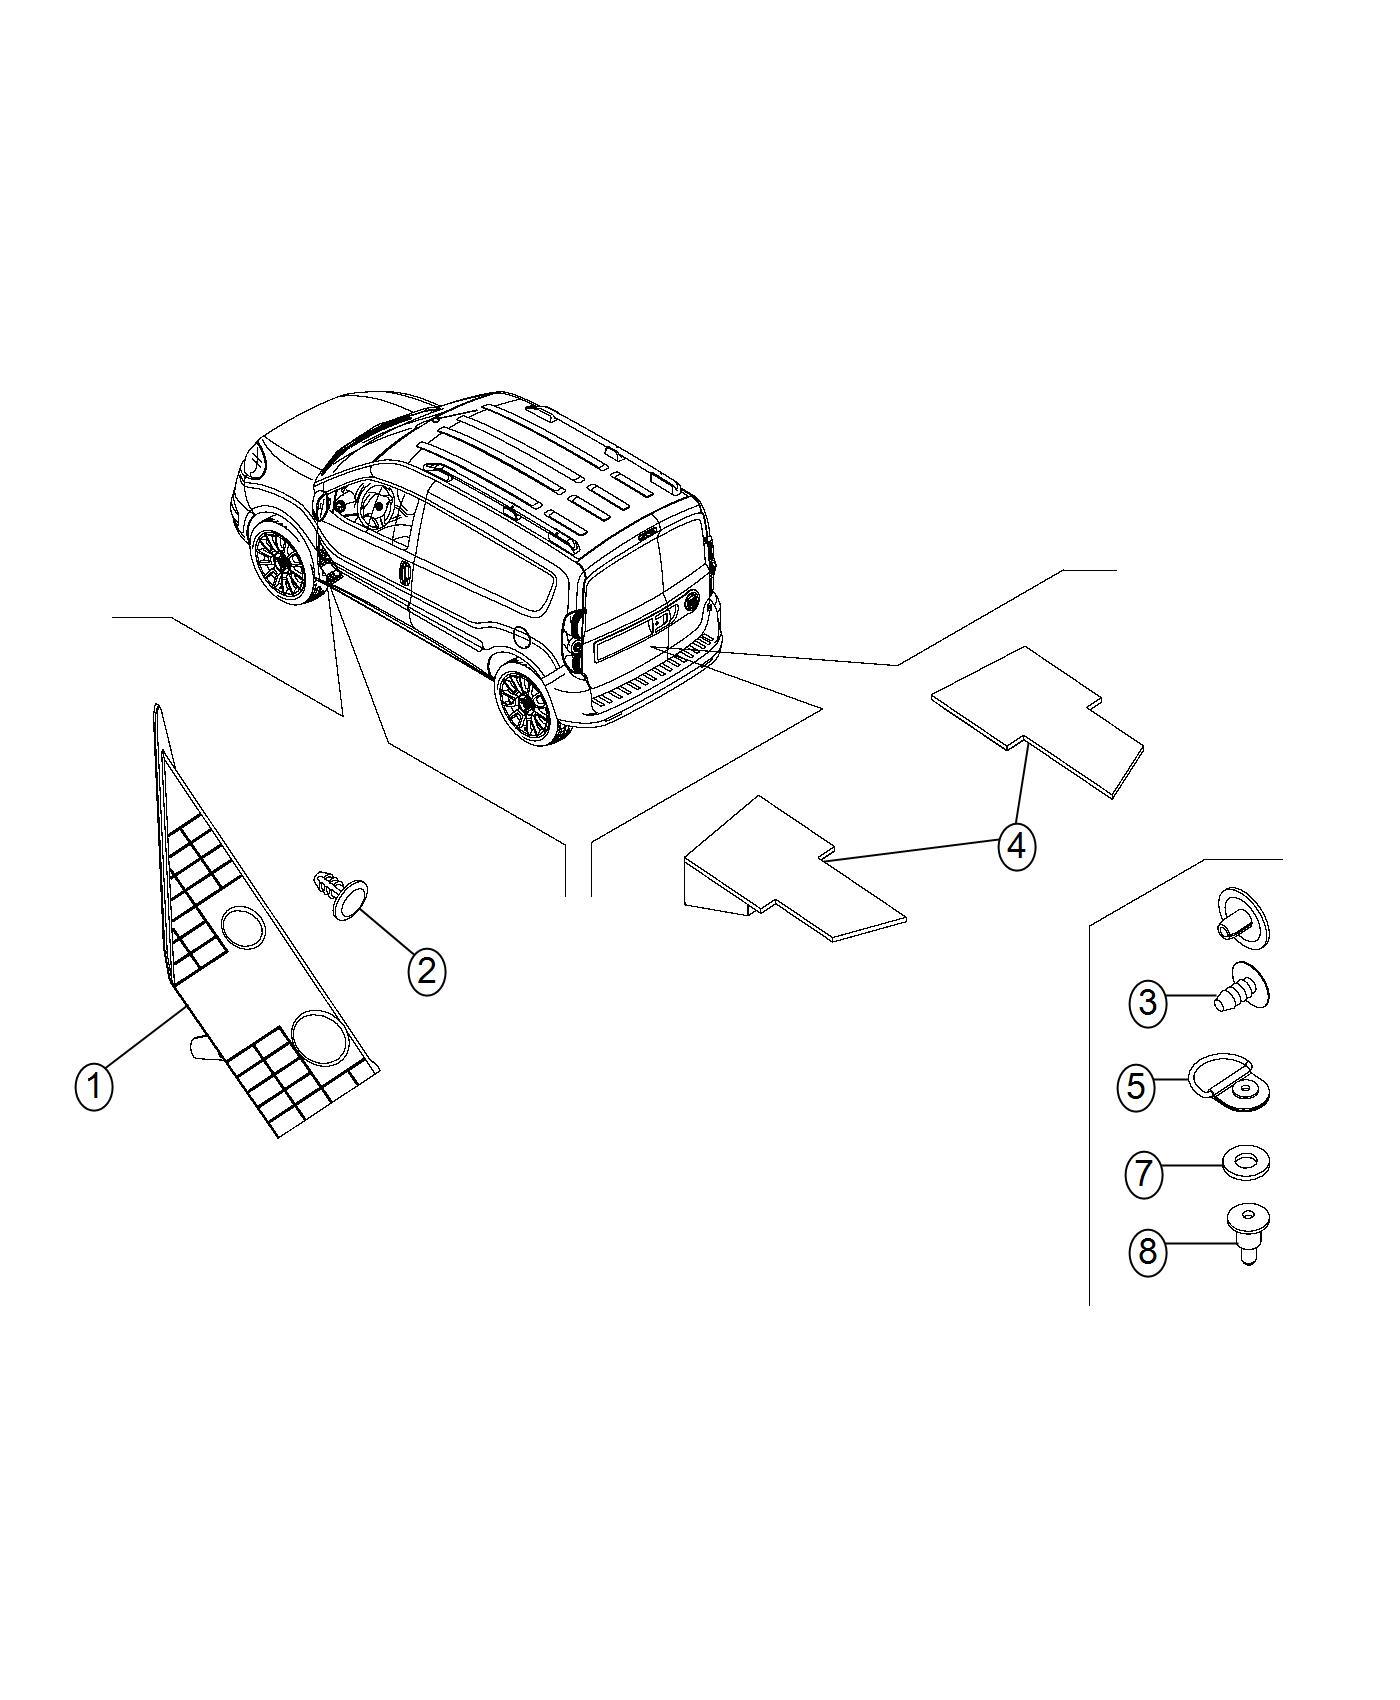 Ram Promaster City Wagon Slt Spacer Mounting